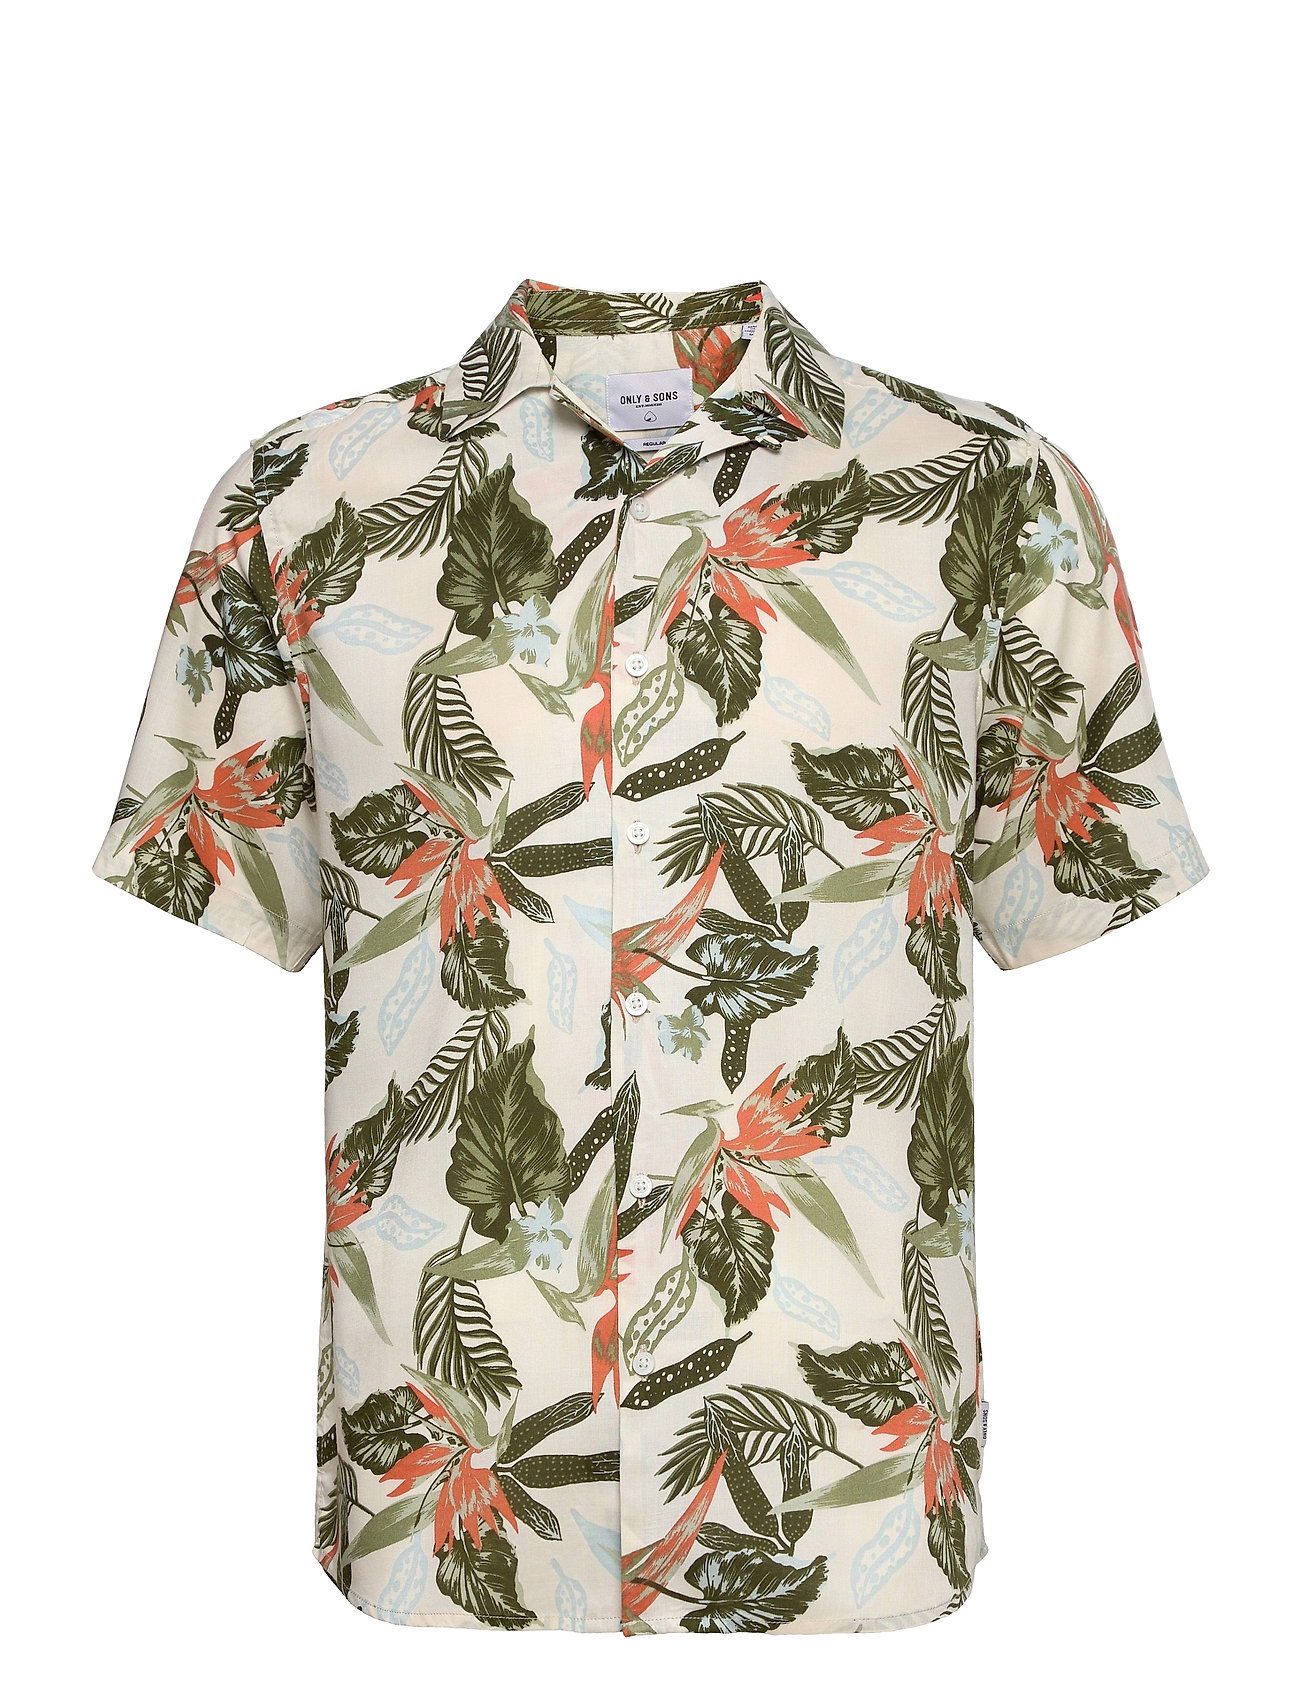 Onsklopp Life Ss Aop Viscose Shirt Kortærmet Skjorte Multi/mønstret ONLY & SONS